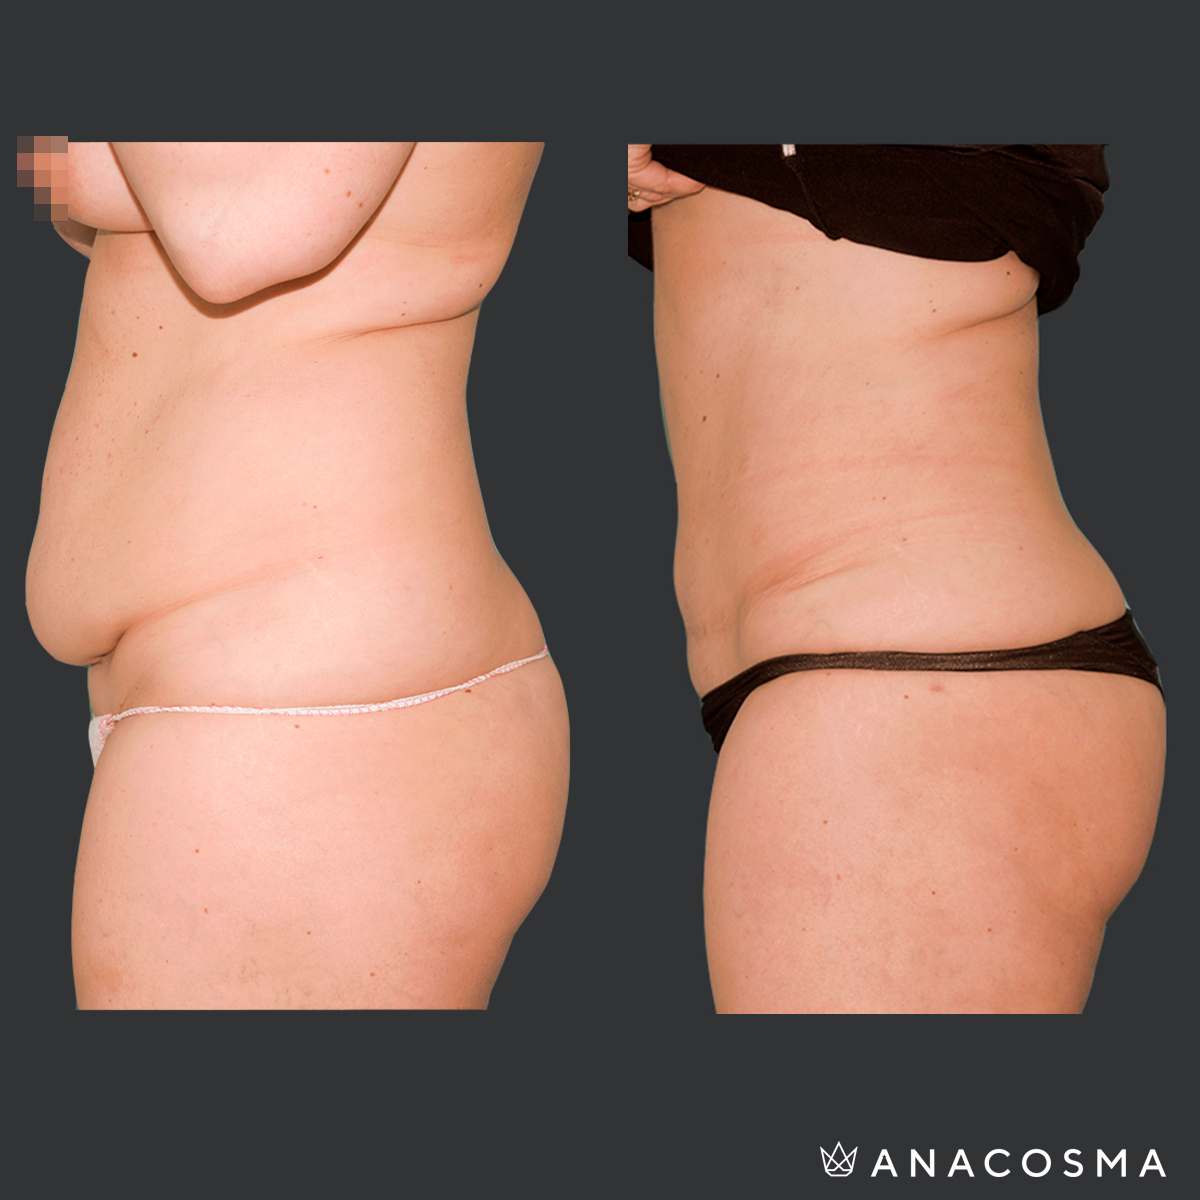 face u pierde in greutate dupa tummy tuck)